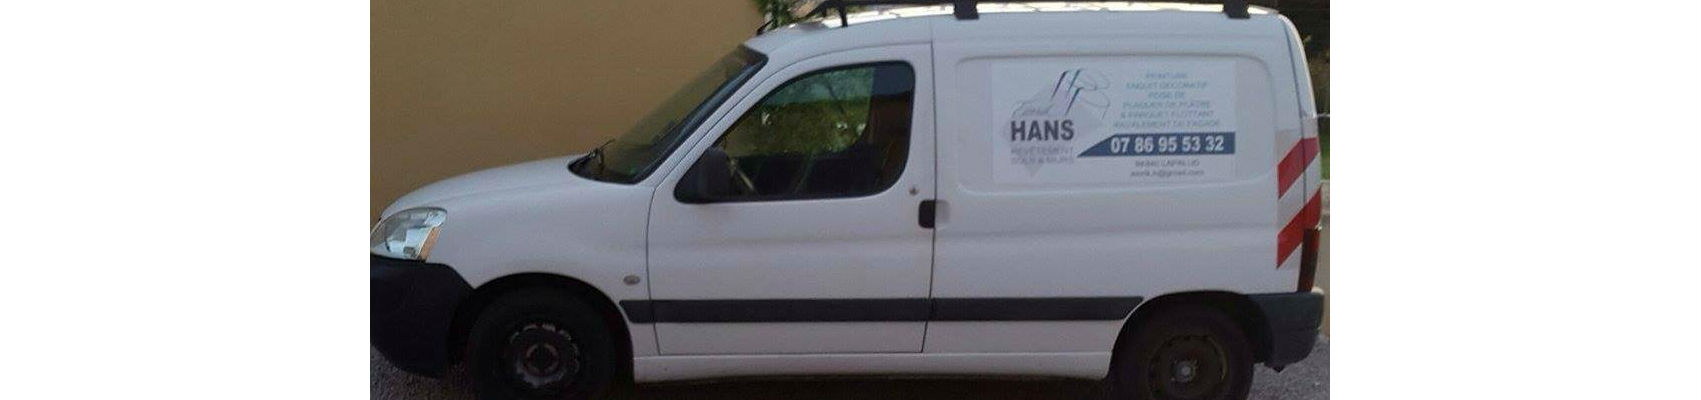 h_hans